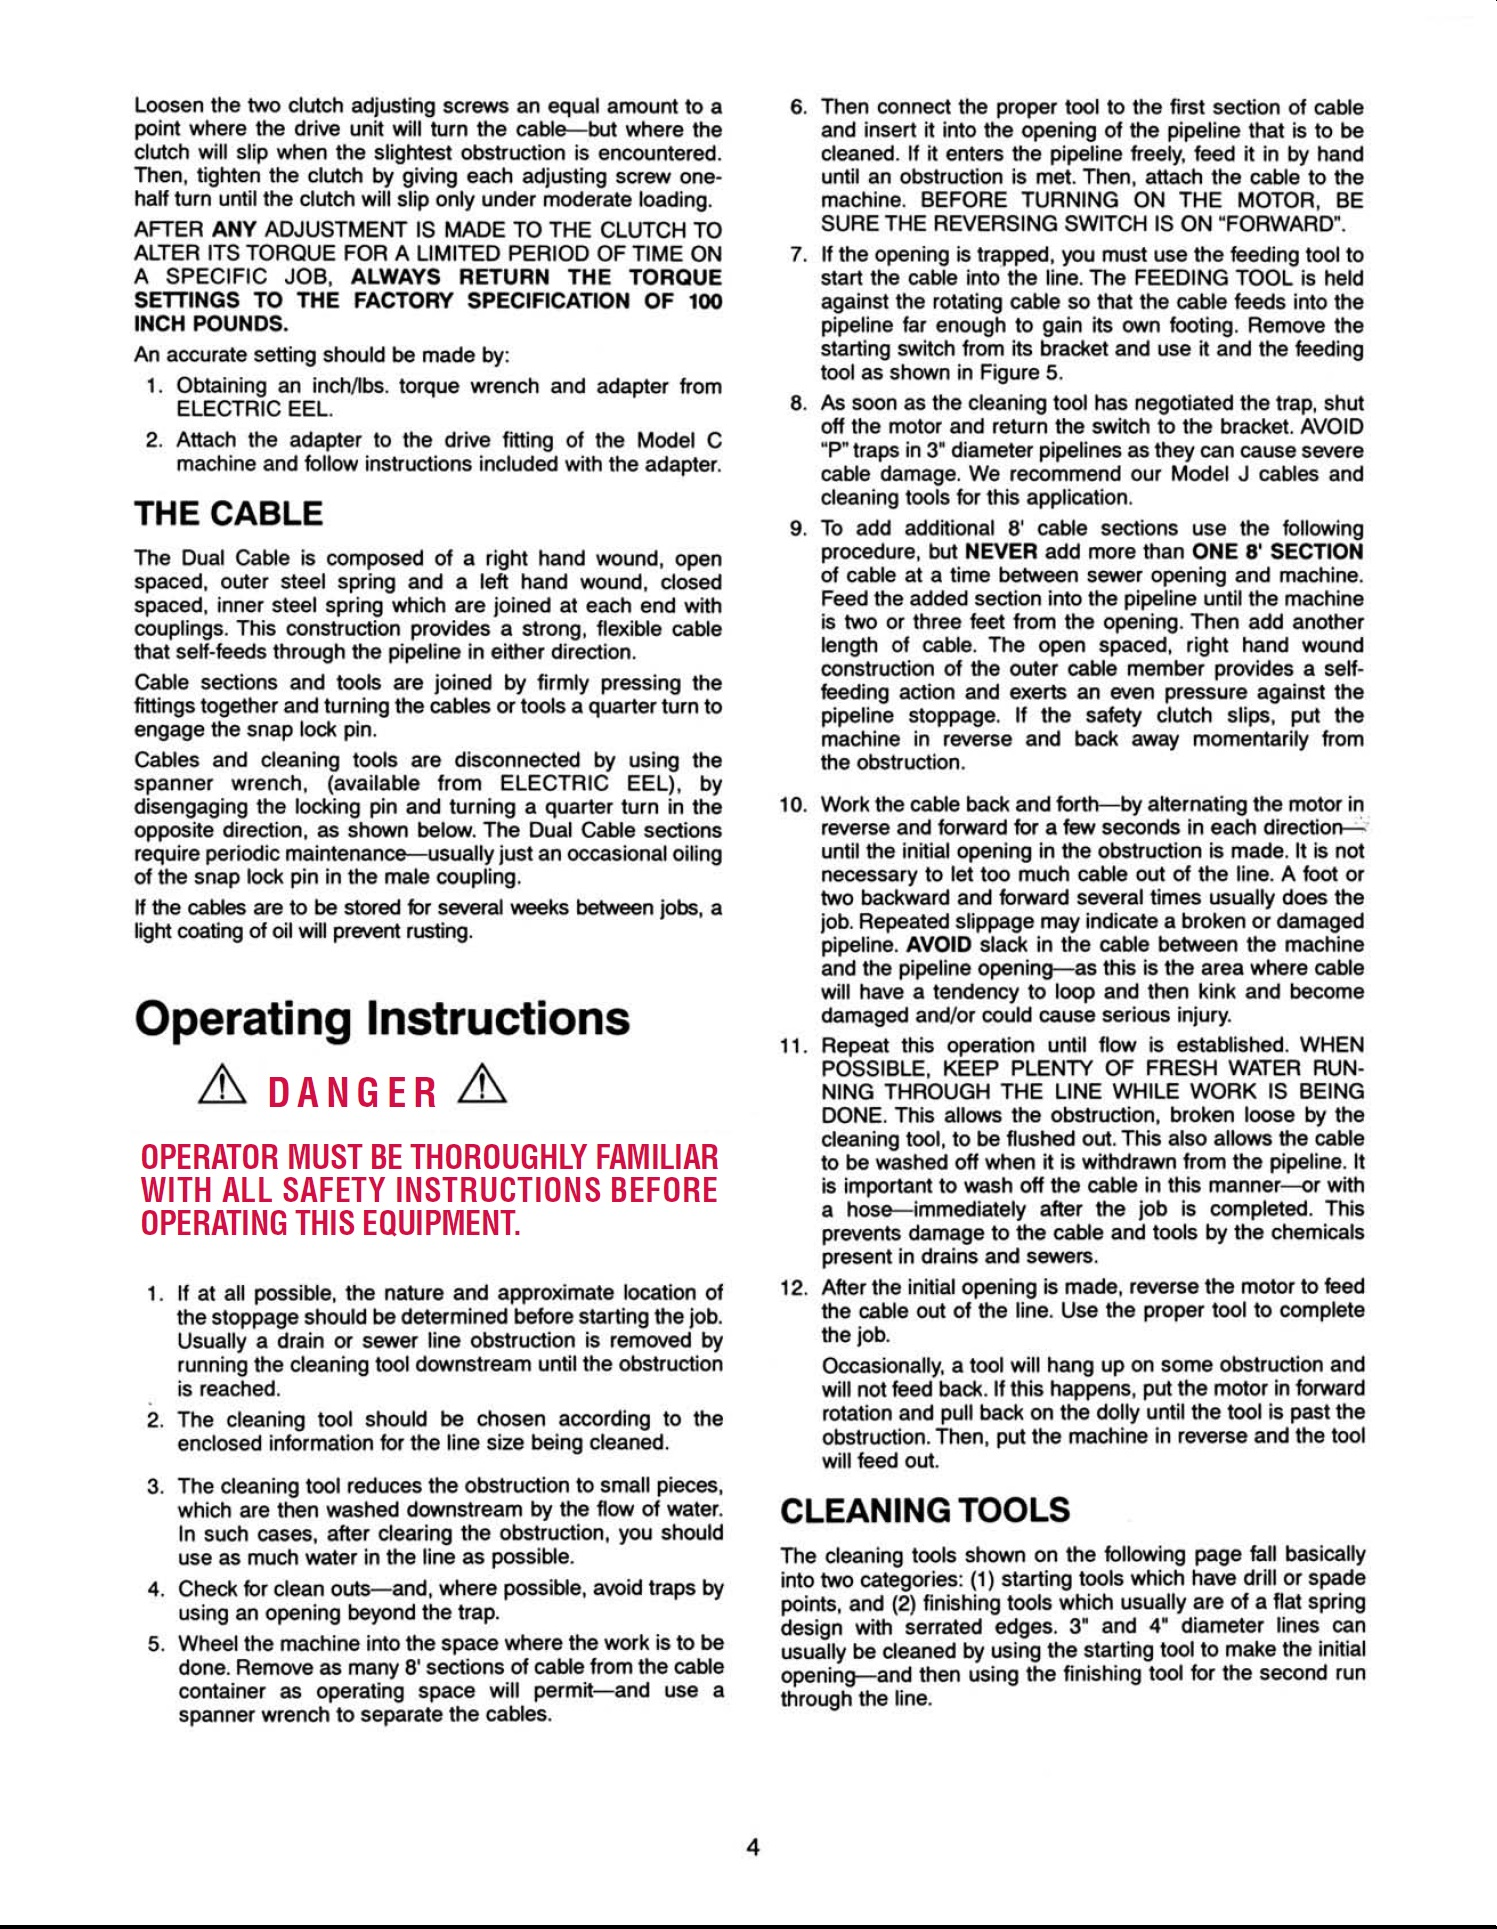 model-c-operating-manual-page-4.jpg